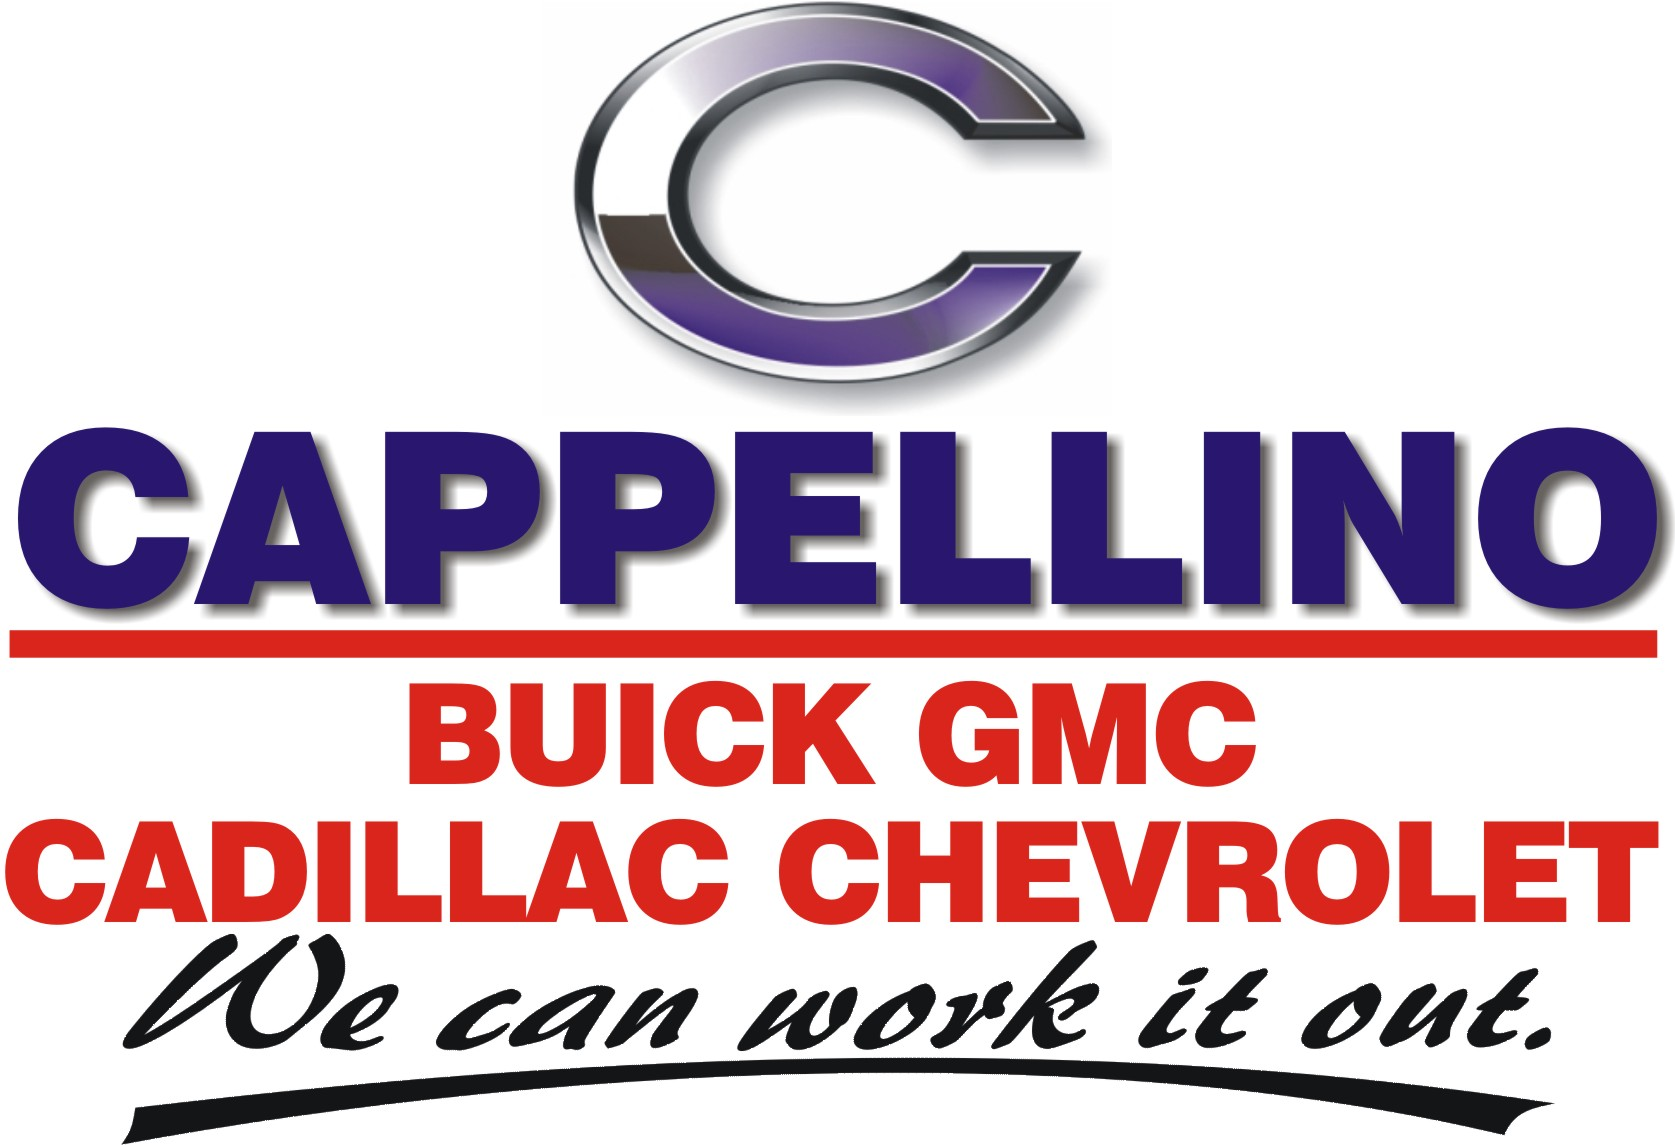 Cappellino Buick GMC, Cappellino Chevrolet & Cappellino Cadillac